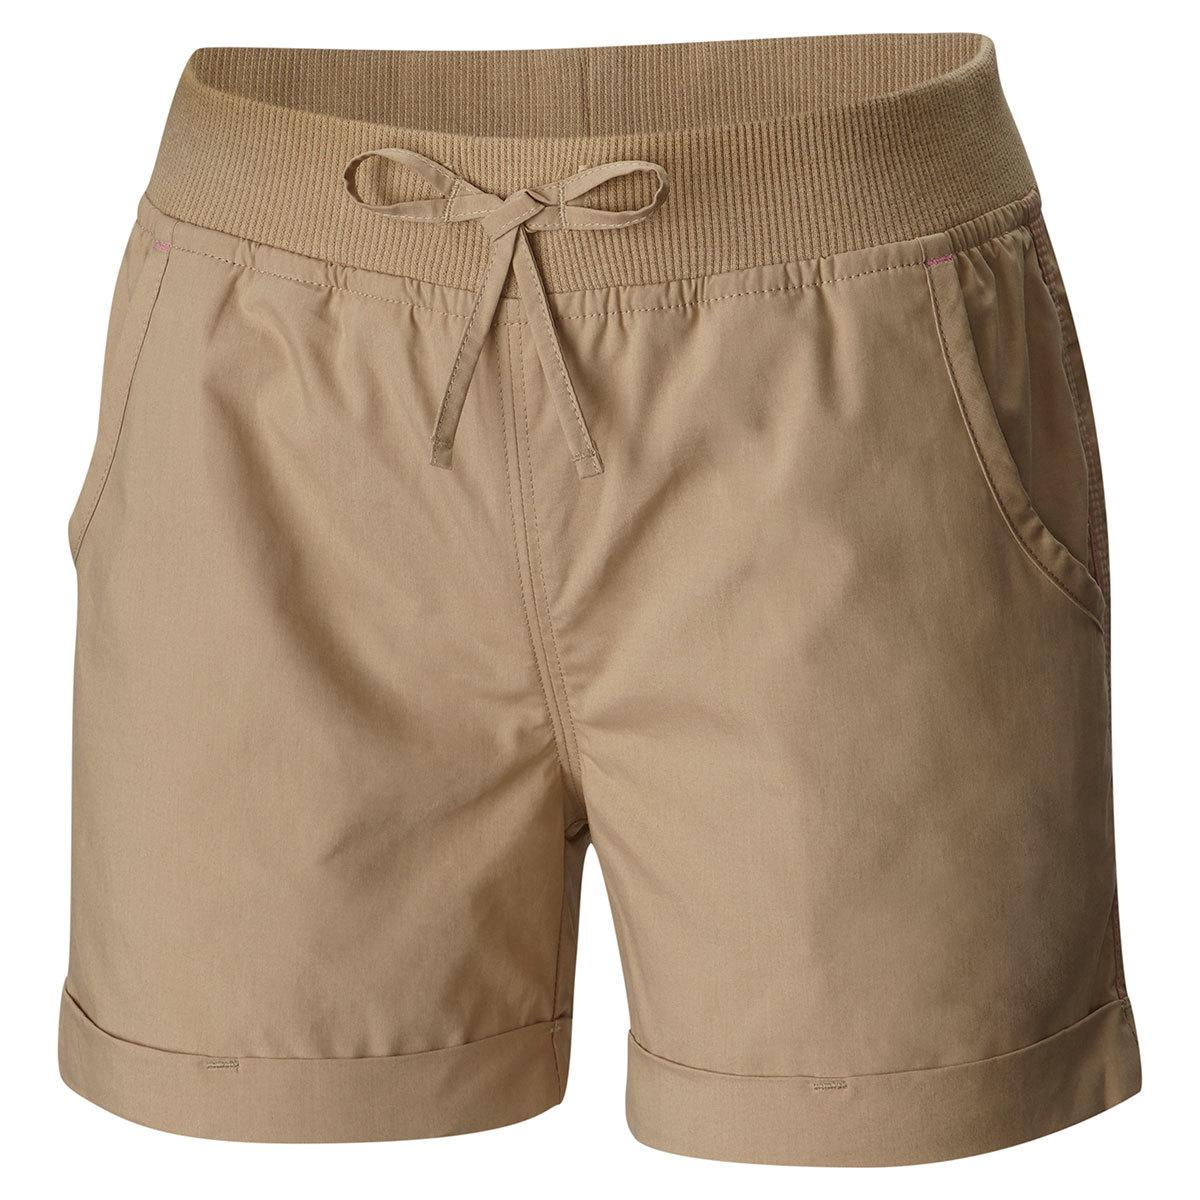 Columbia Big Girls' 5 Oaks Ii Pull-On Shorts - Brown, L